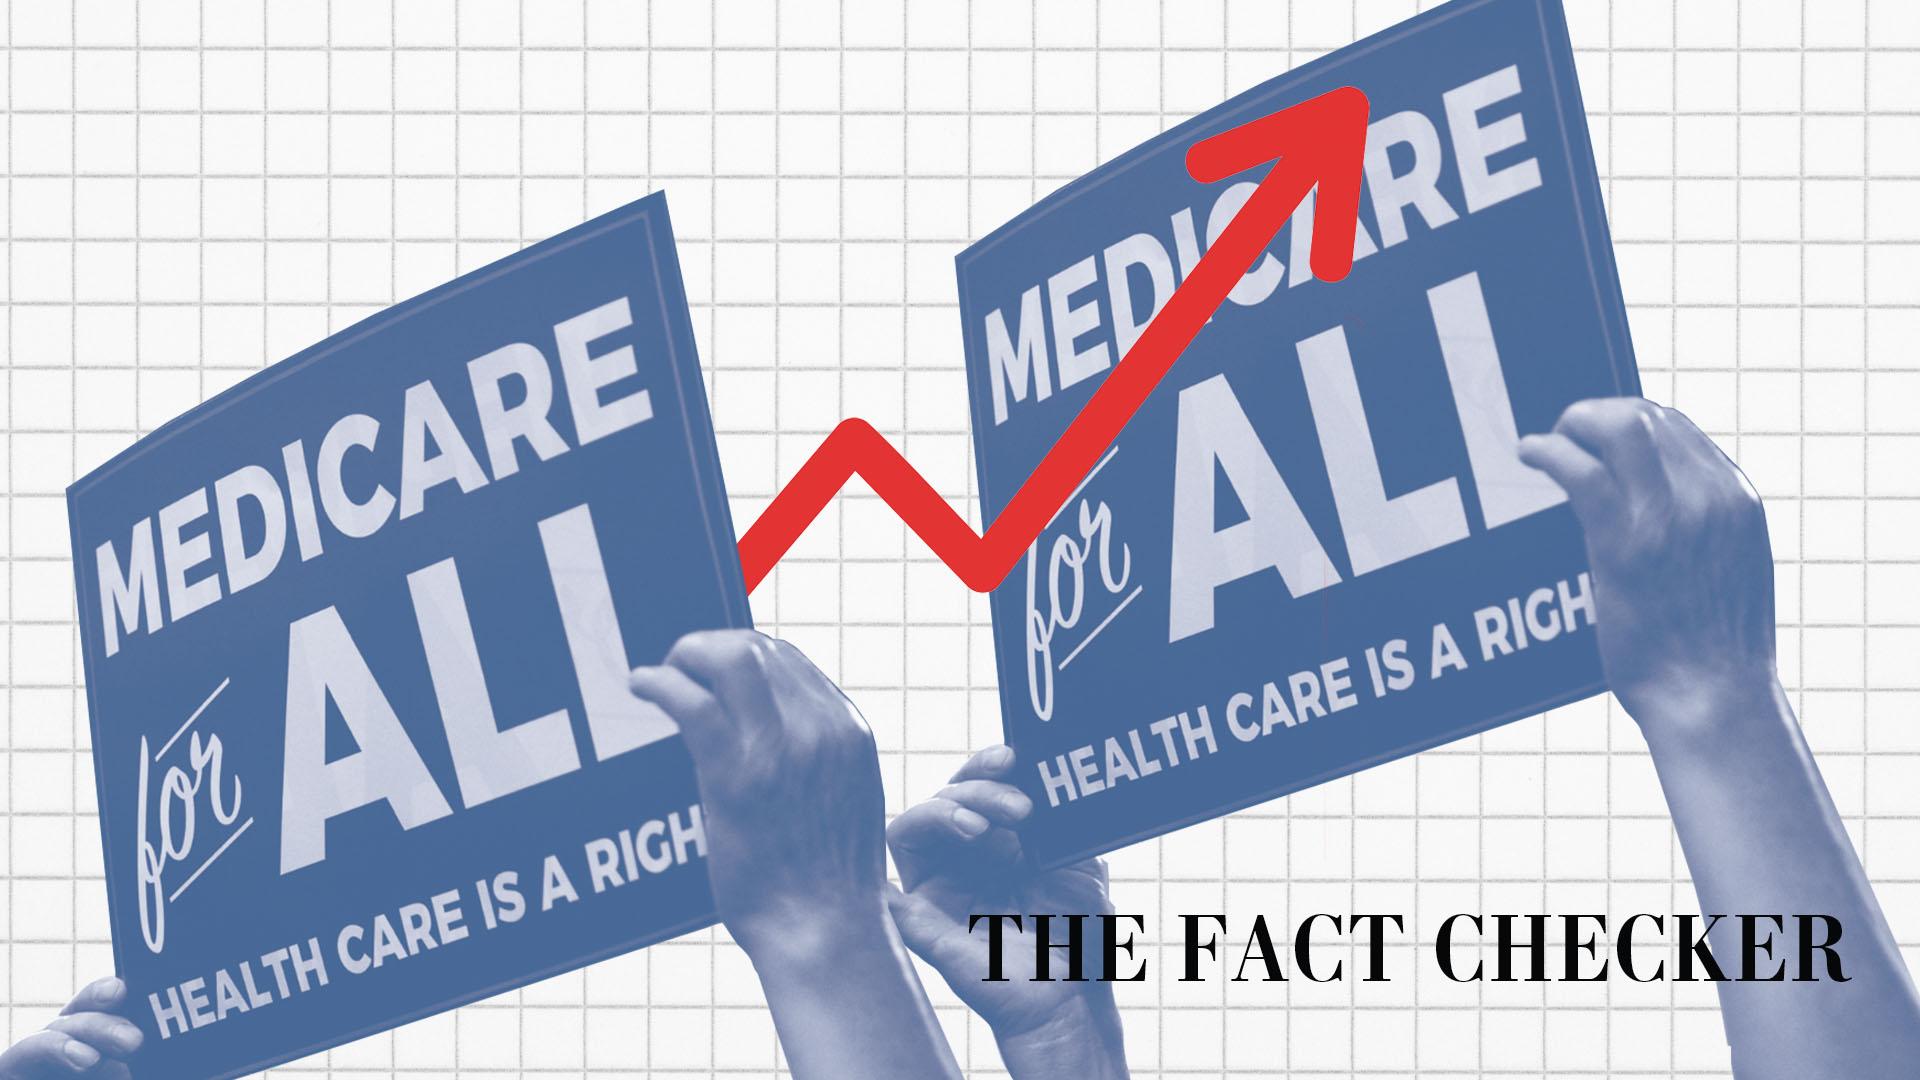 Democrats back off once-fervent embrace of Medicare-for-all